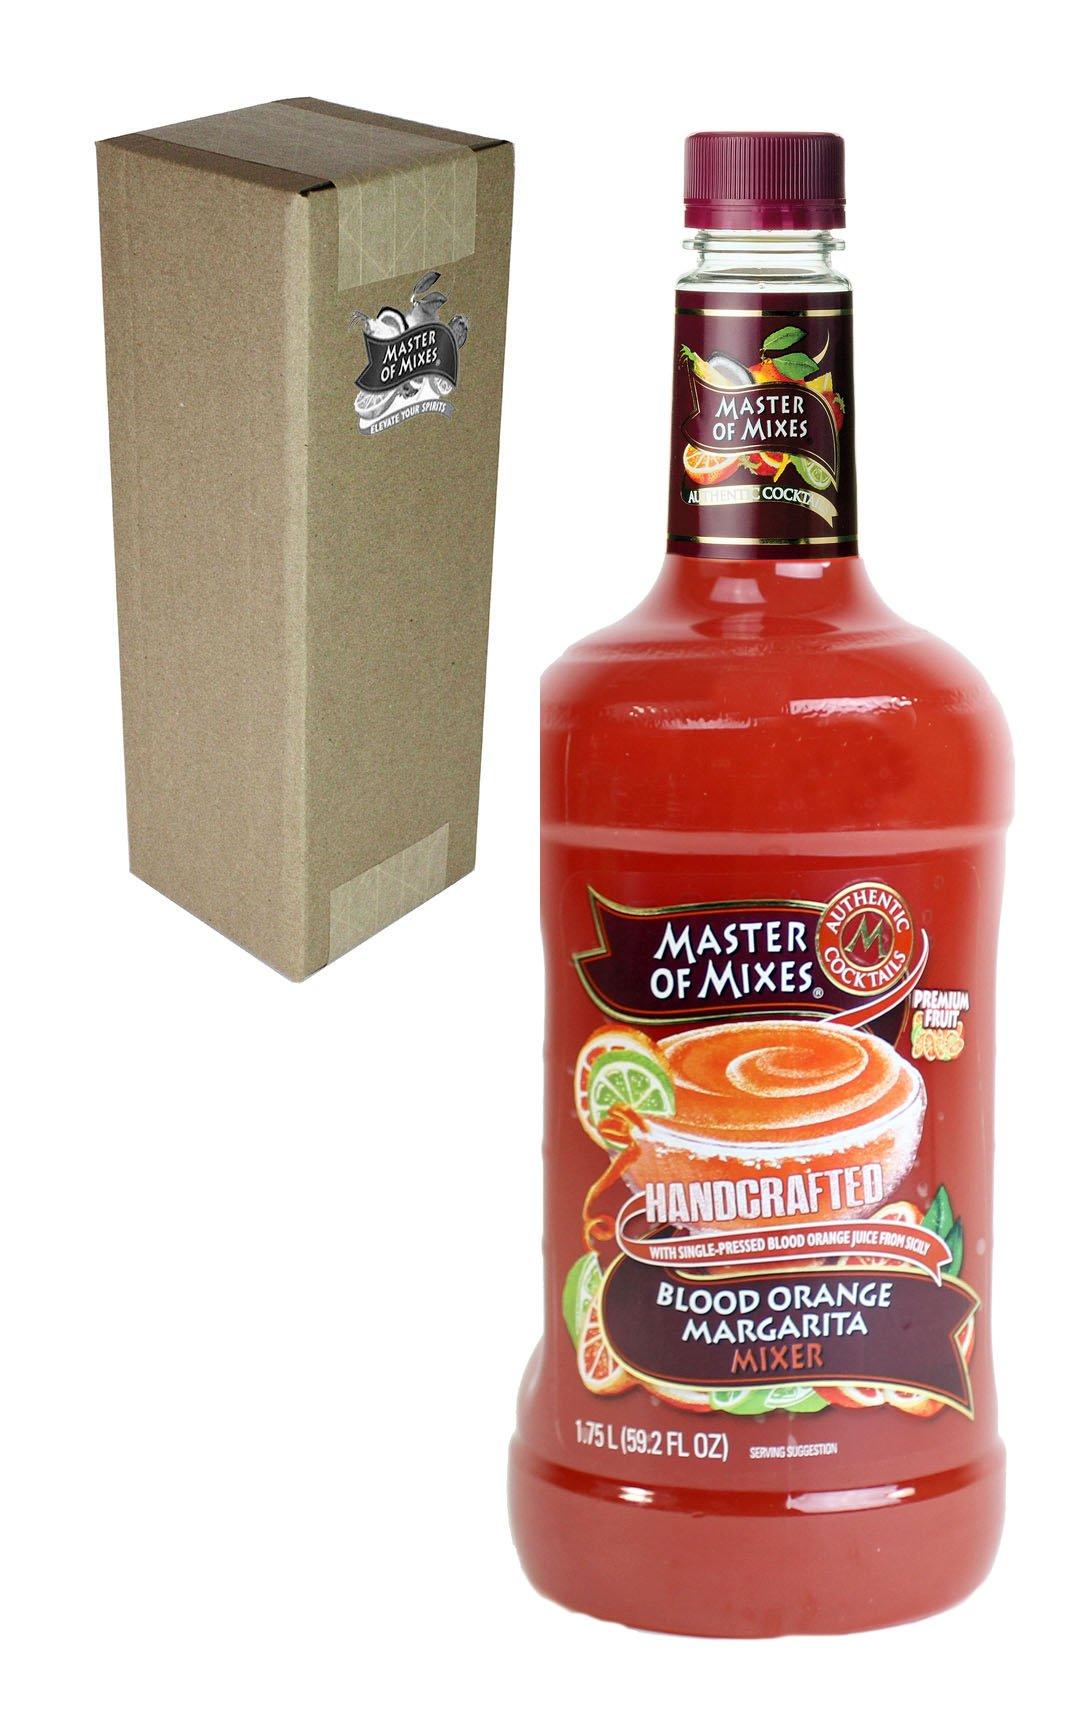 Master of Mixes Blood Orange Margarita Drink Mix, Ready to Use, 1.75 Liter Bottle (59.2 Fl Oz), Individually Boxed